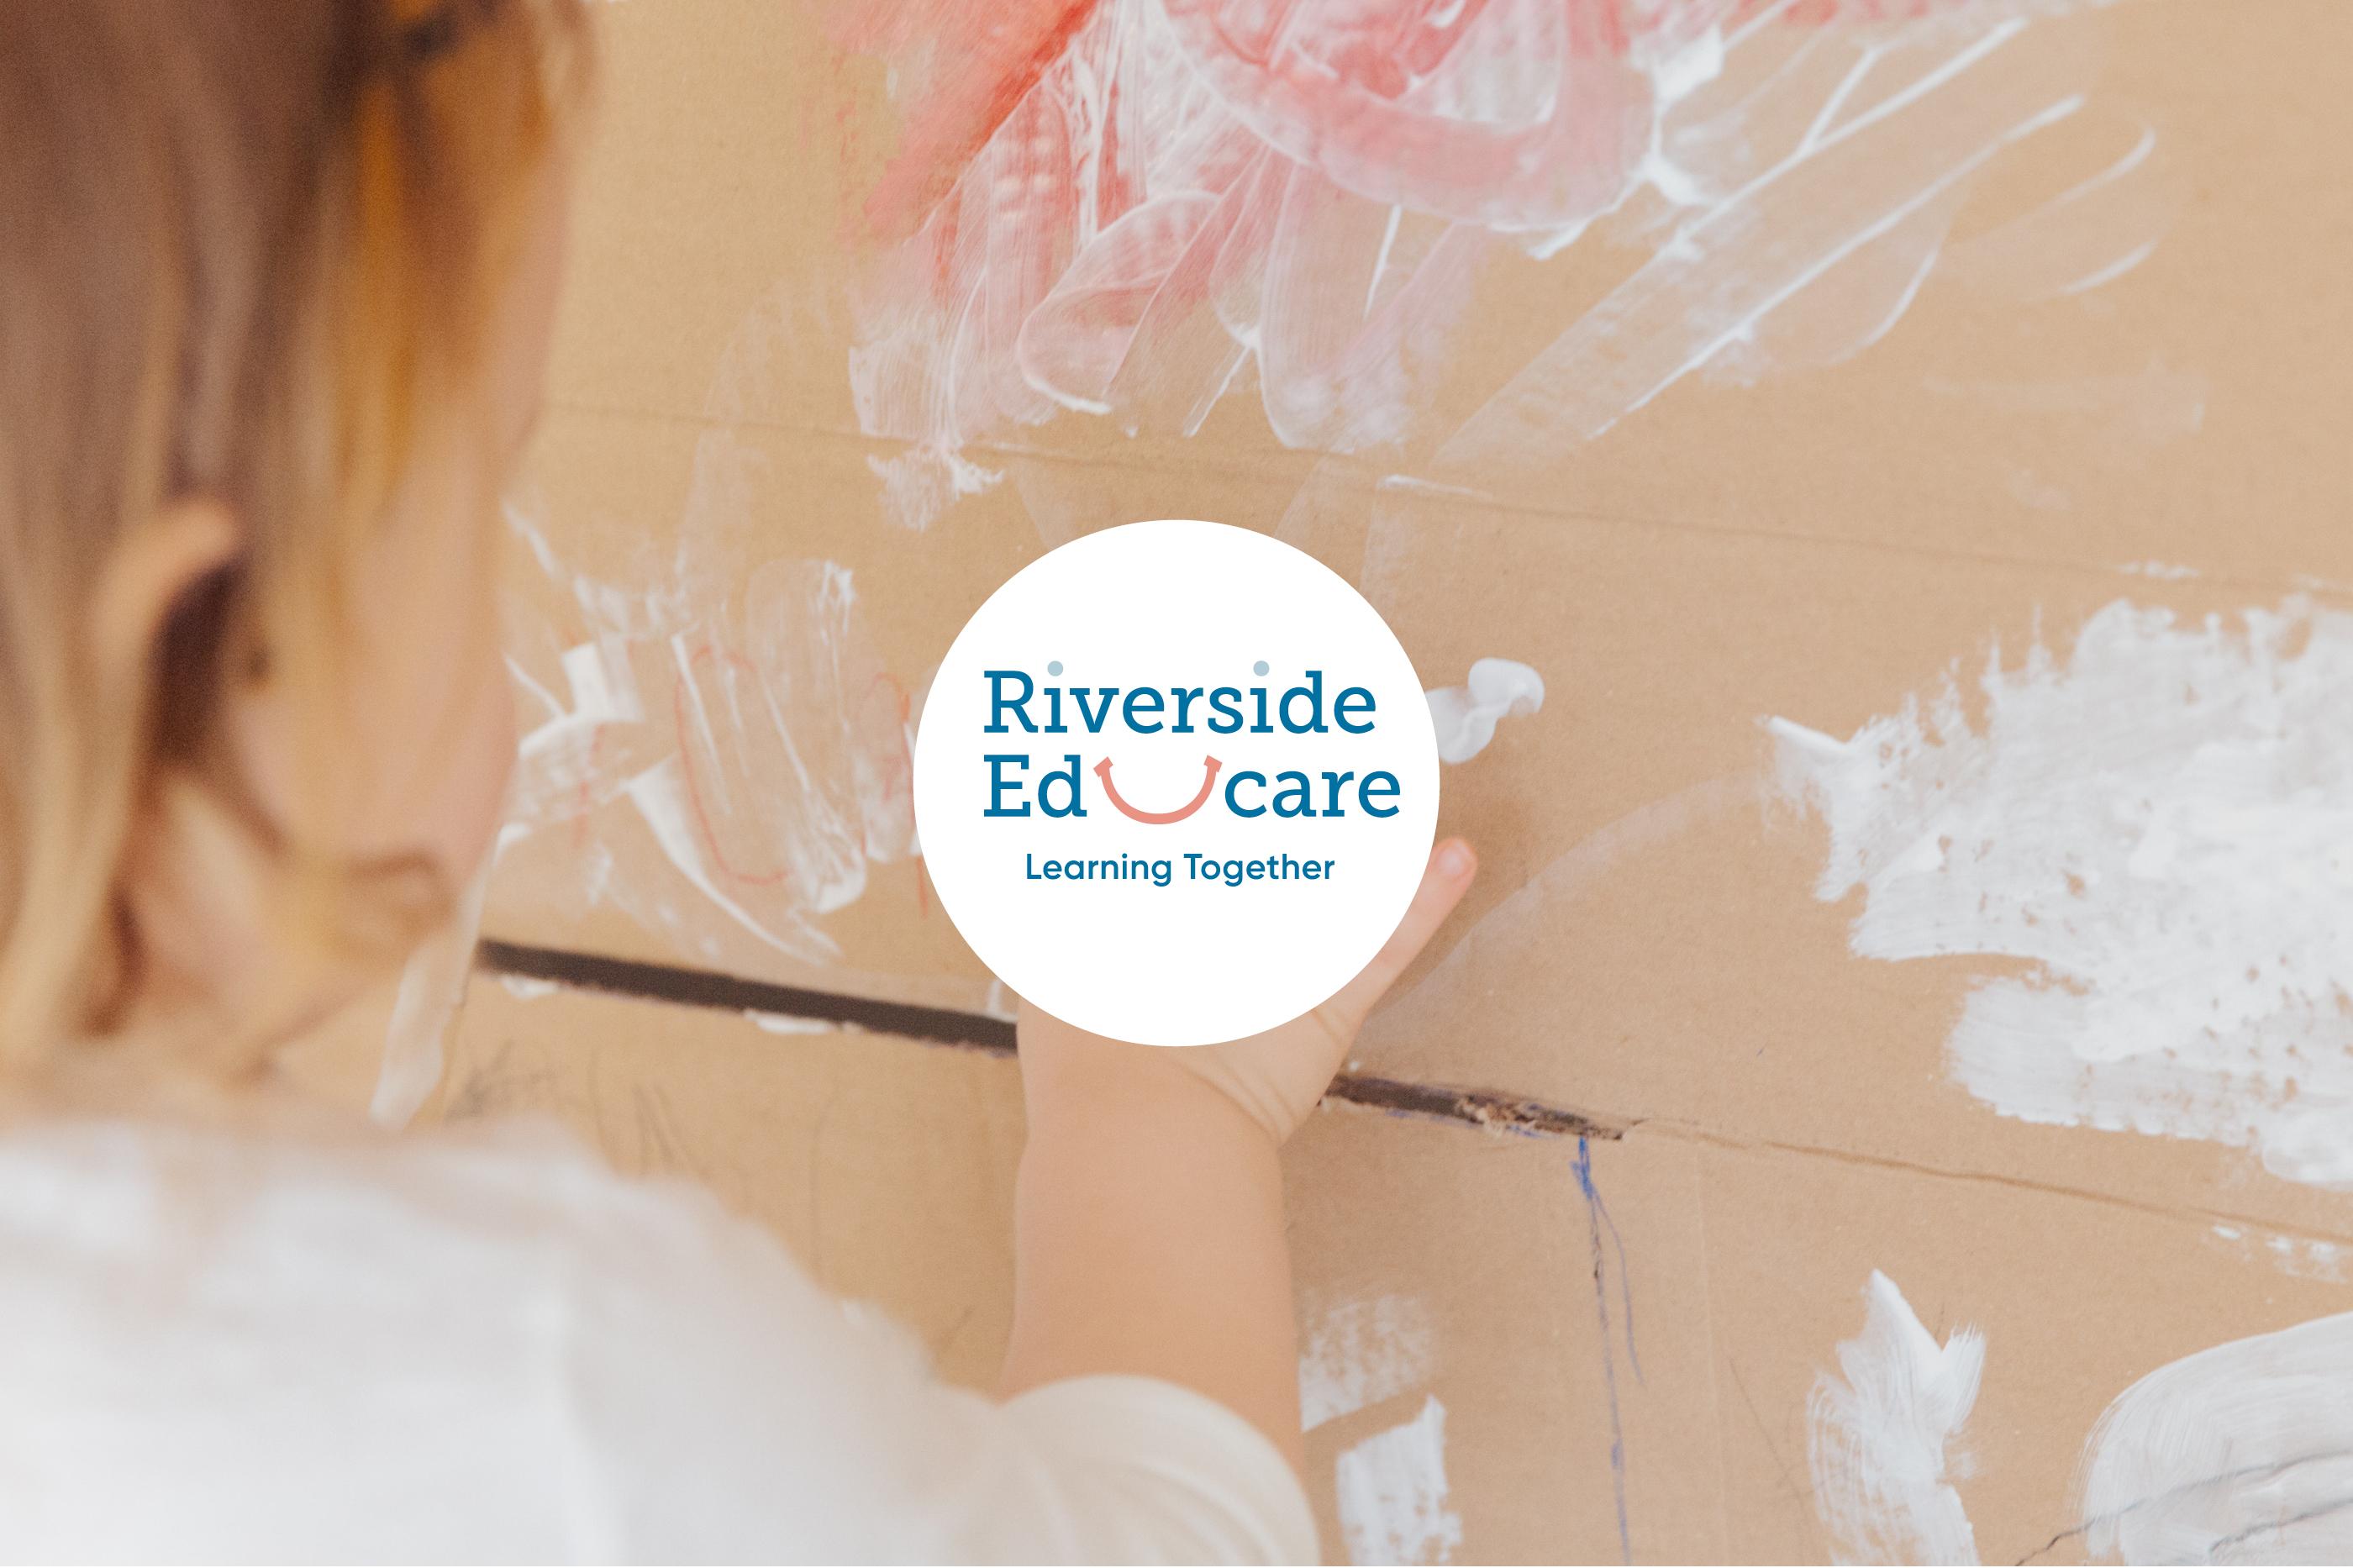 Riverside Educare